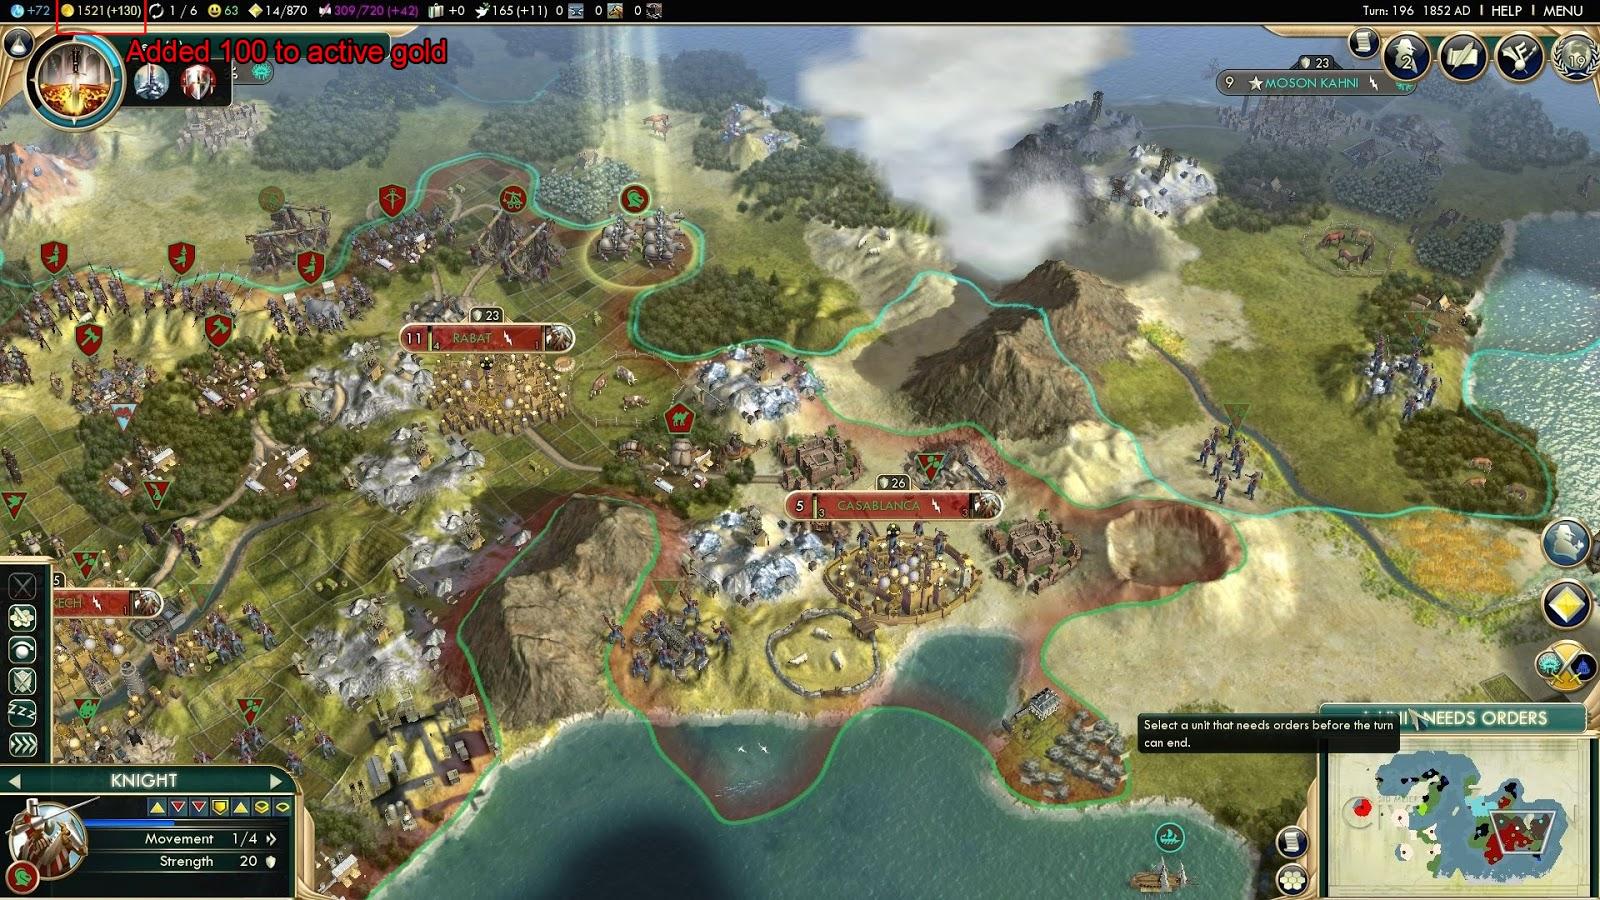 Civilization 6 Hack - Download Free Updated Civilization 6